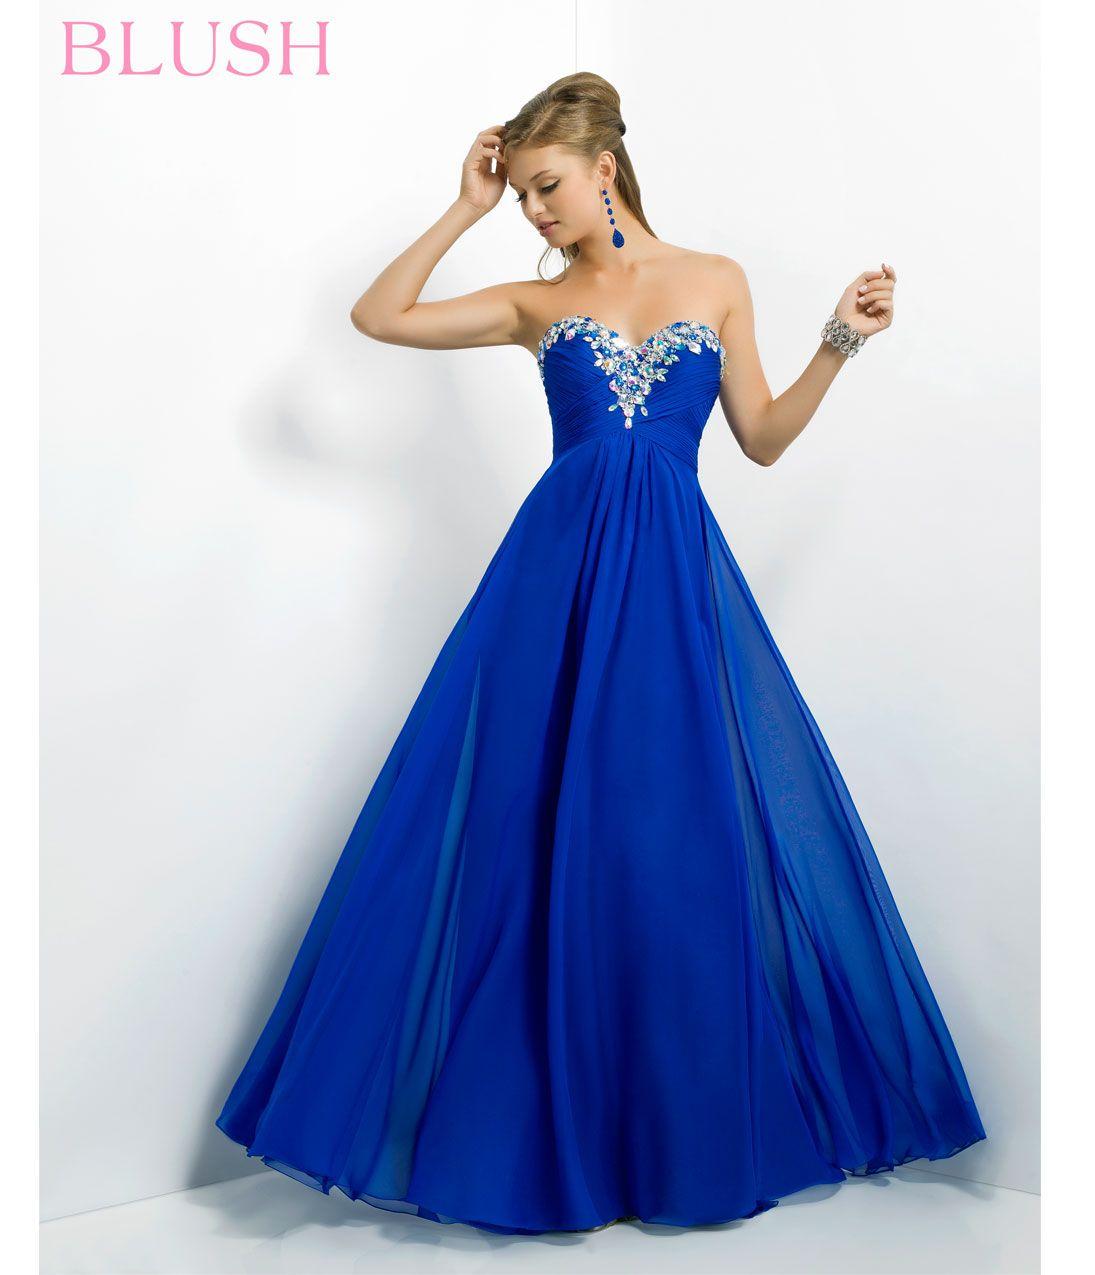 168 Stop Staring! 1930s Style Navy & Ivory Railene Dress | Prom ...